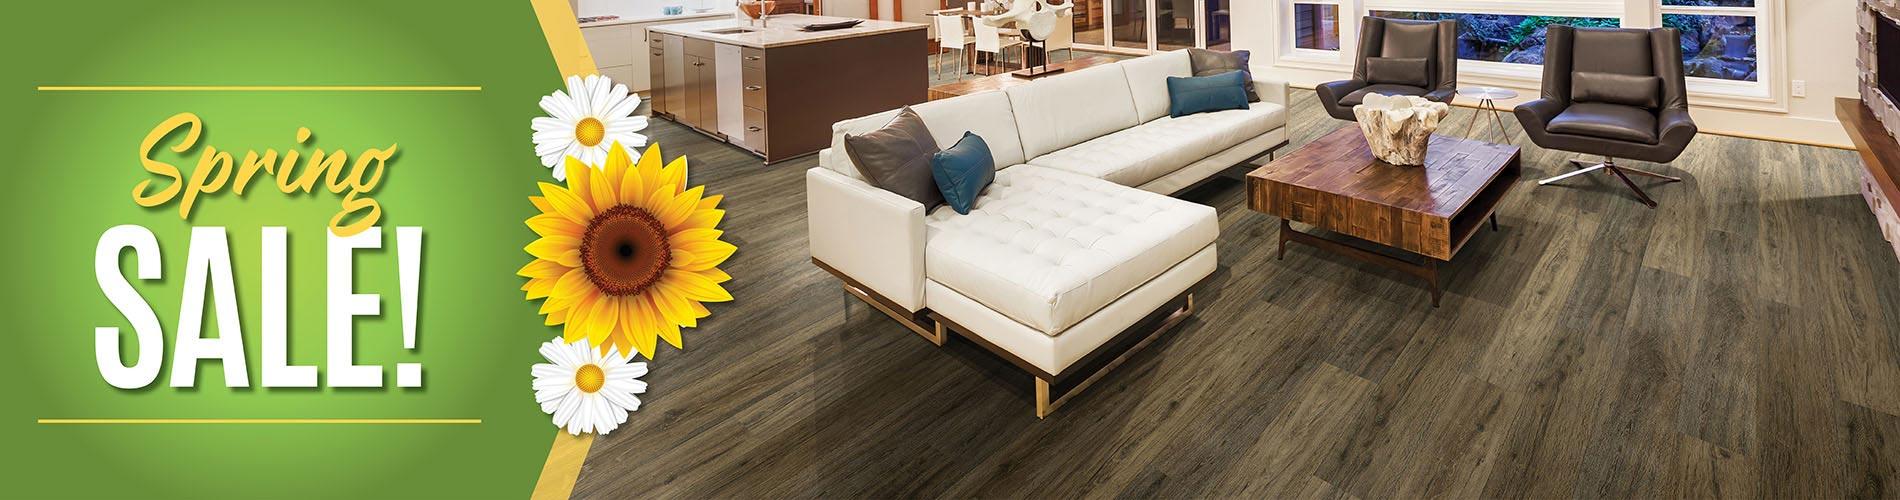 Spring Sale at Independent Flooring